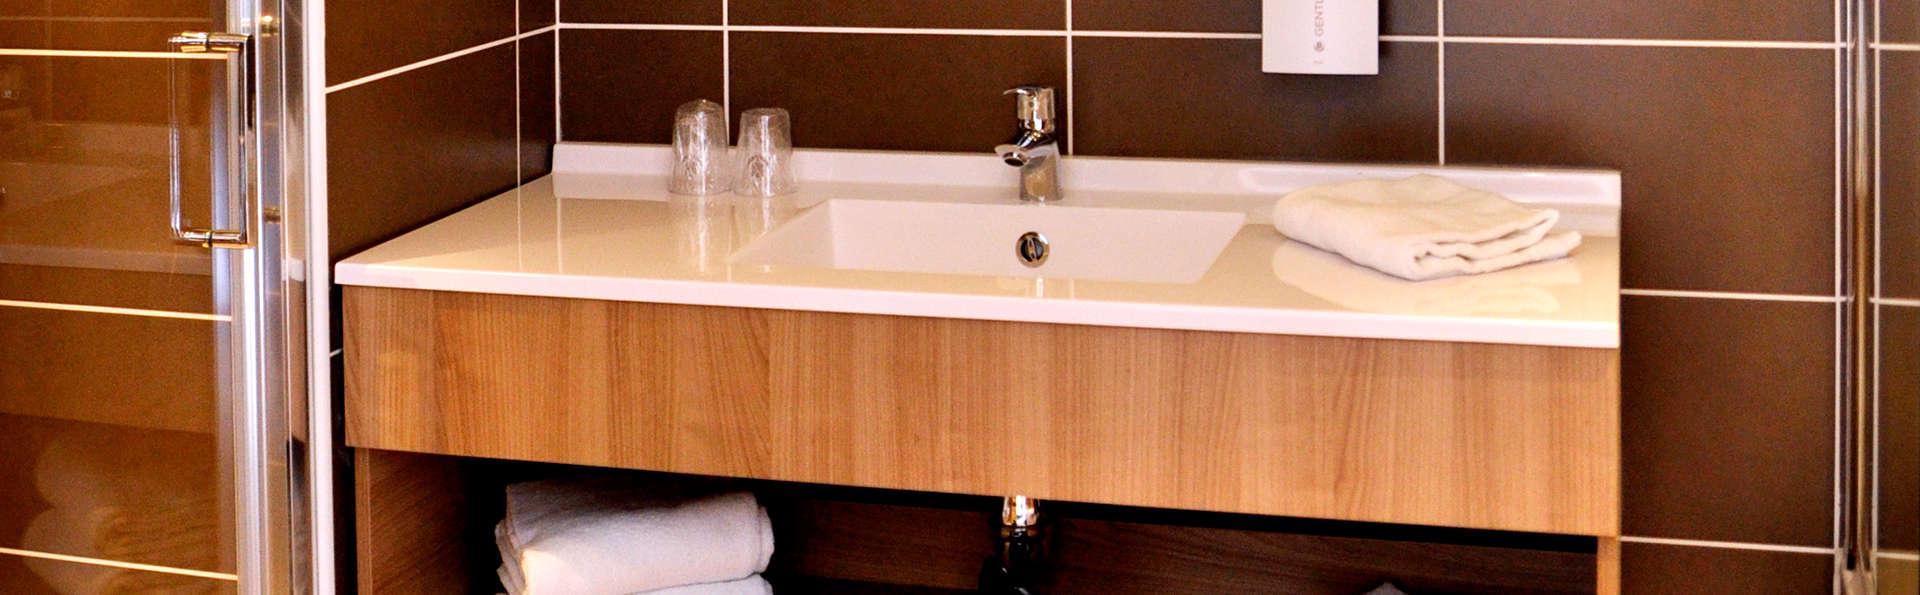 Golden Tulip La Baule Suites - Edit_Bathroom.jpg